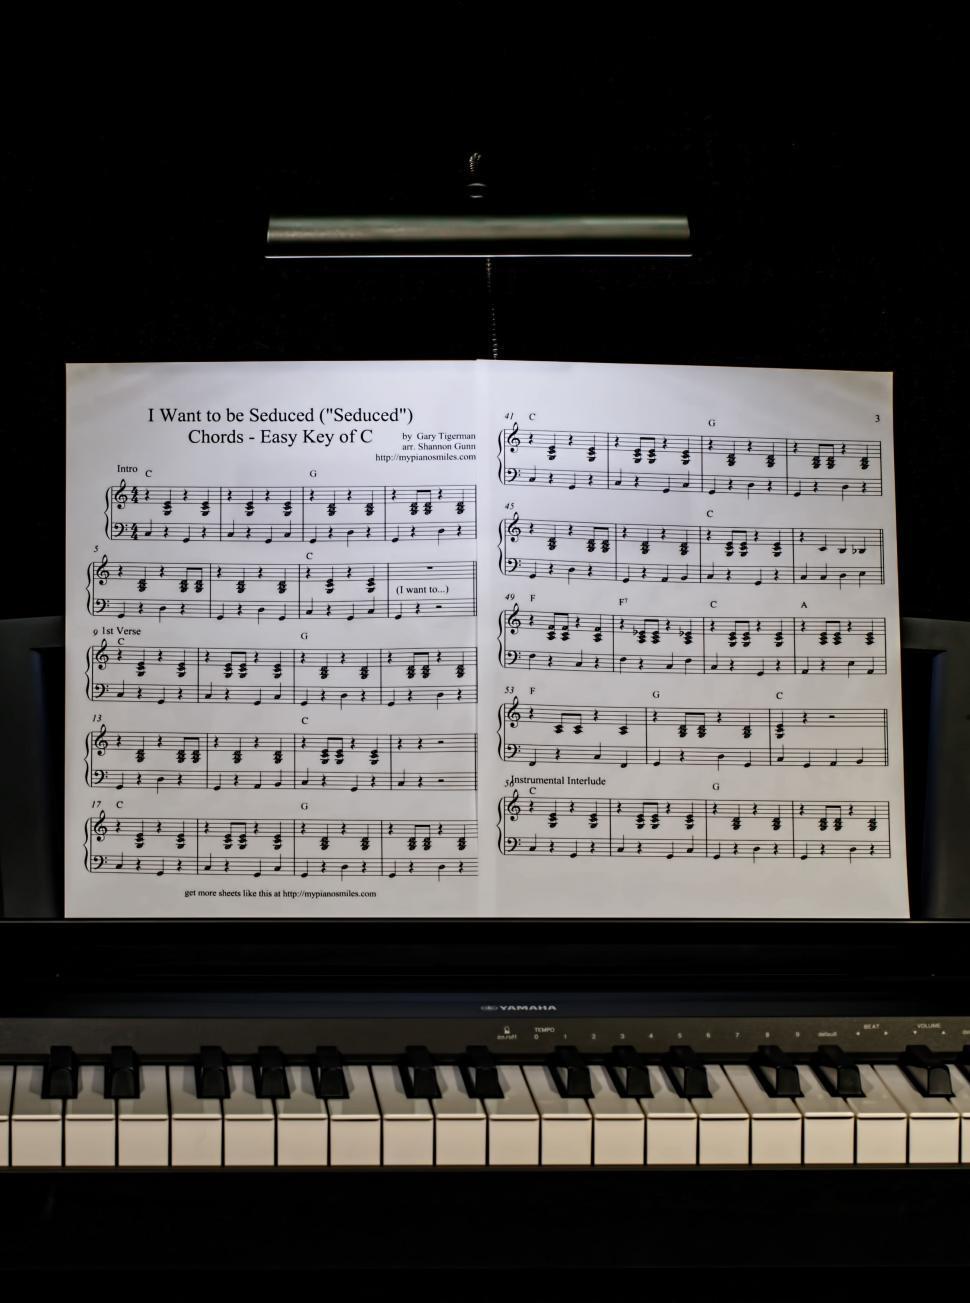 Download Free Stock Photo of piano lesson music keyboard piano pianist practice light darkness music stand music score sheet music dark